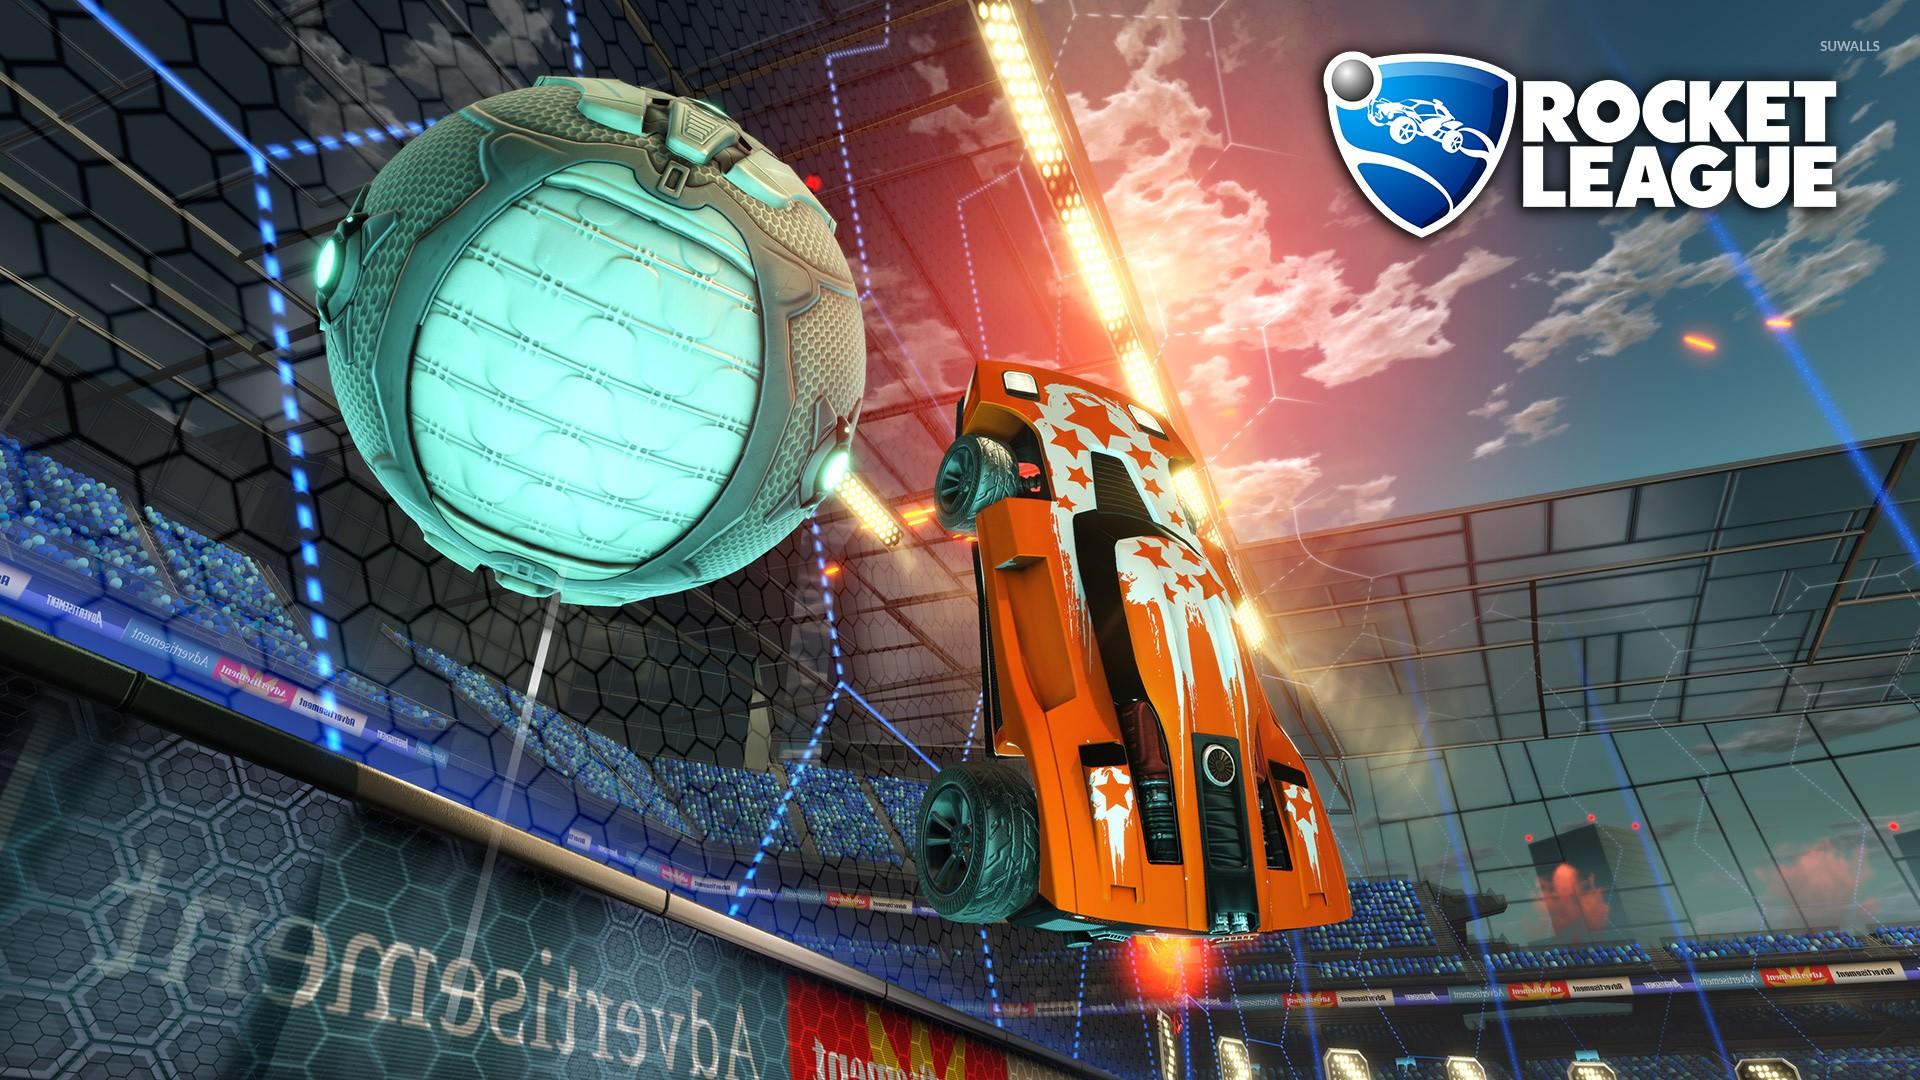 Rocket League Wallpaper ·① Download Free HD Backgrounds